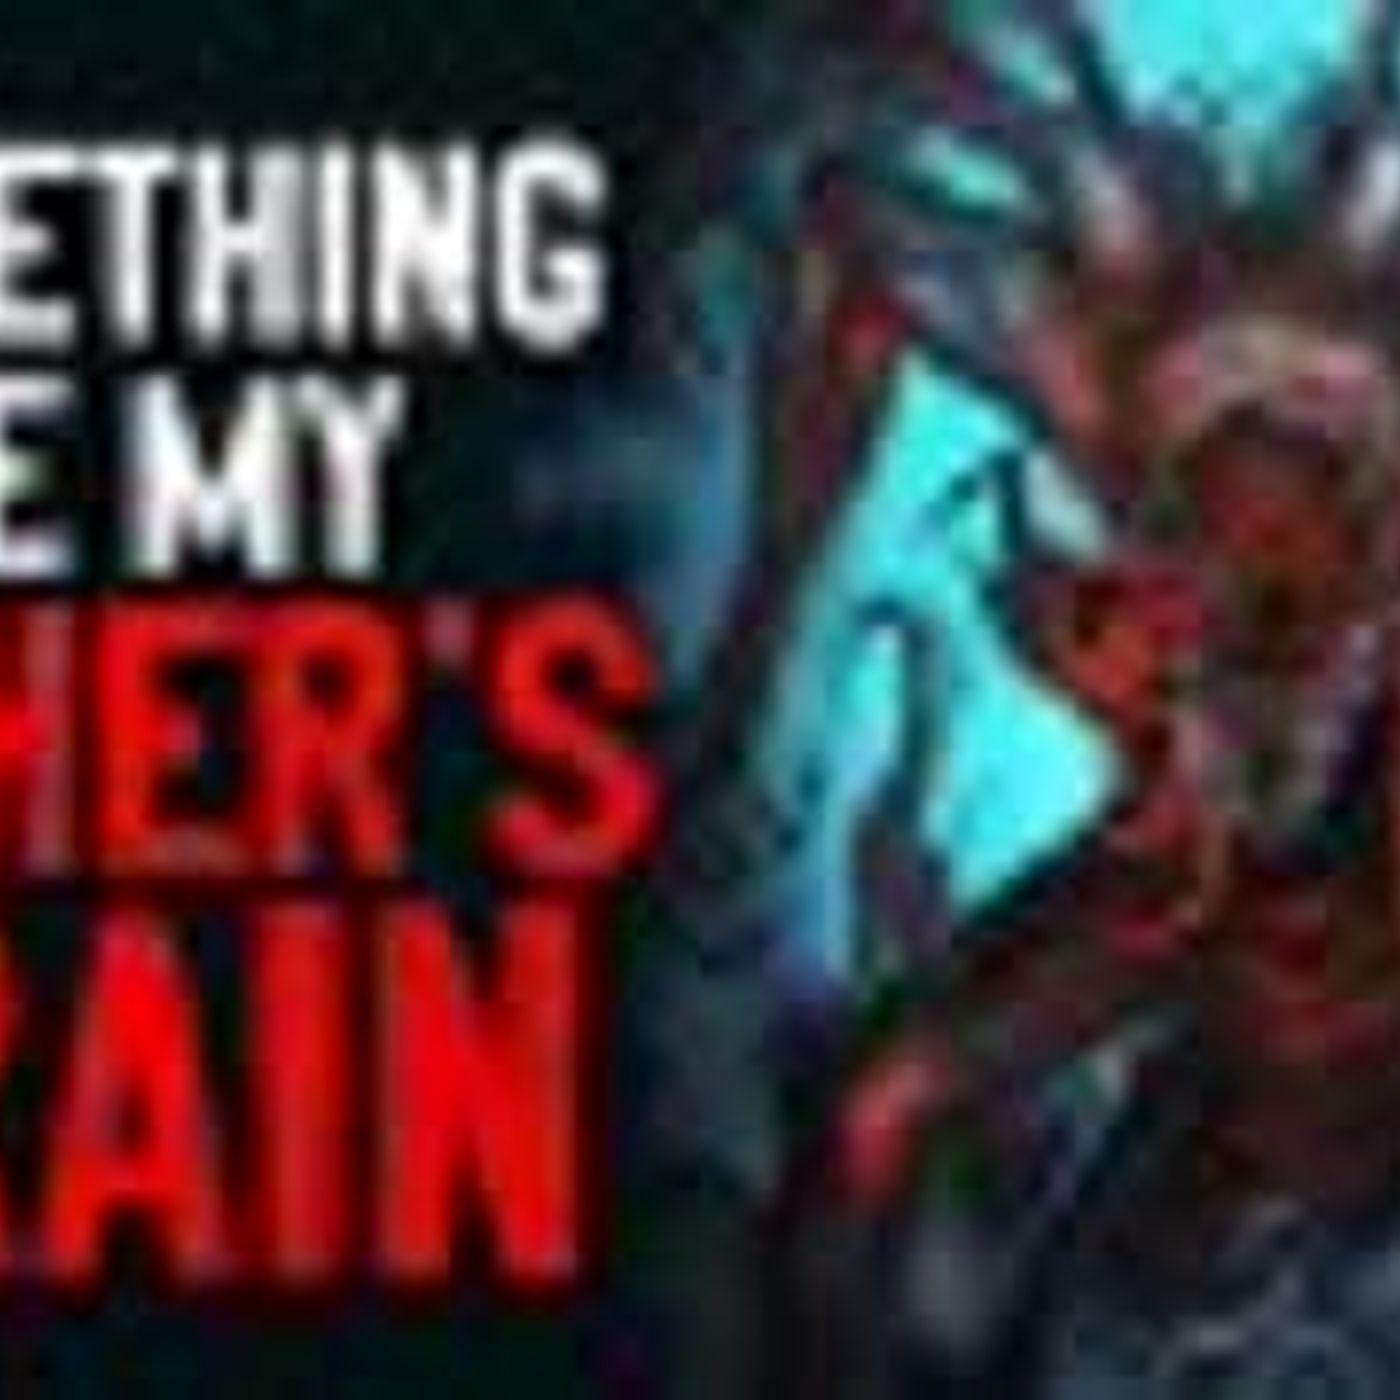 """Something Ate My Father's Brain"" Creepypasta"